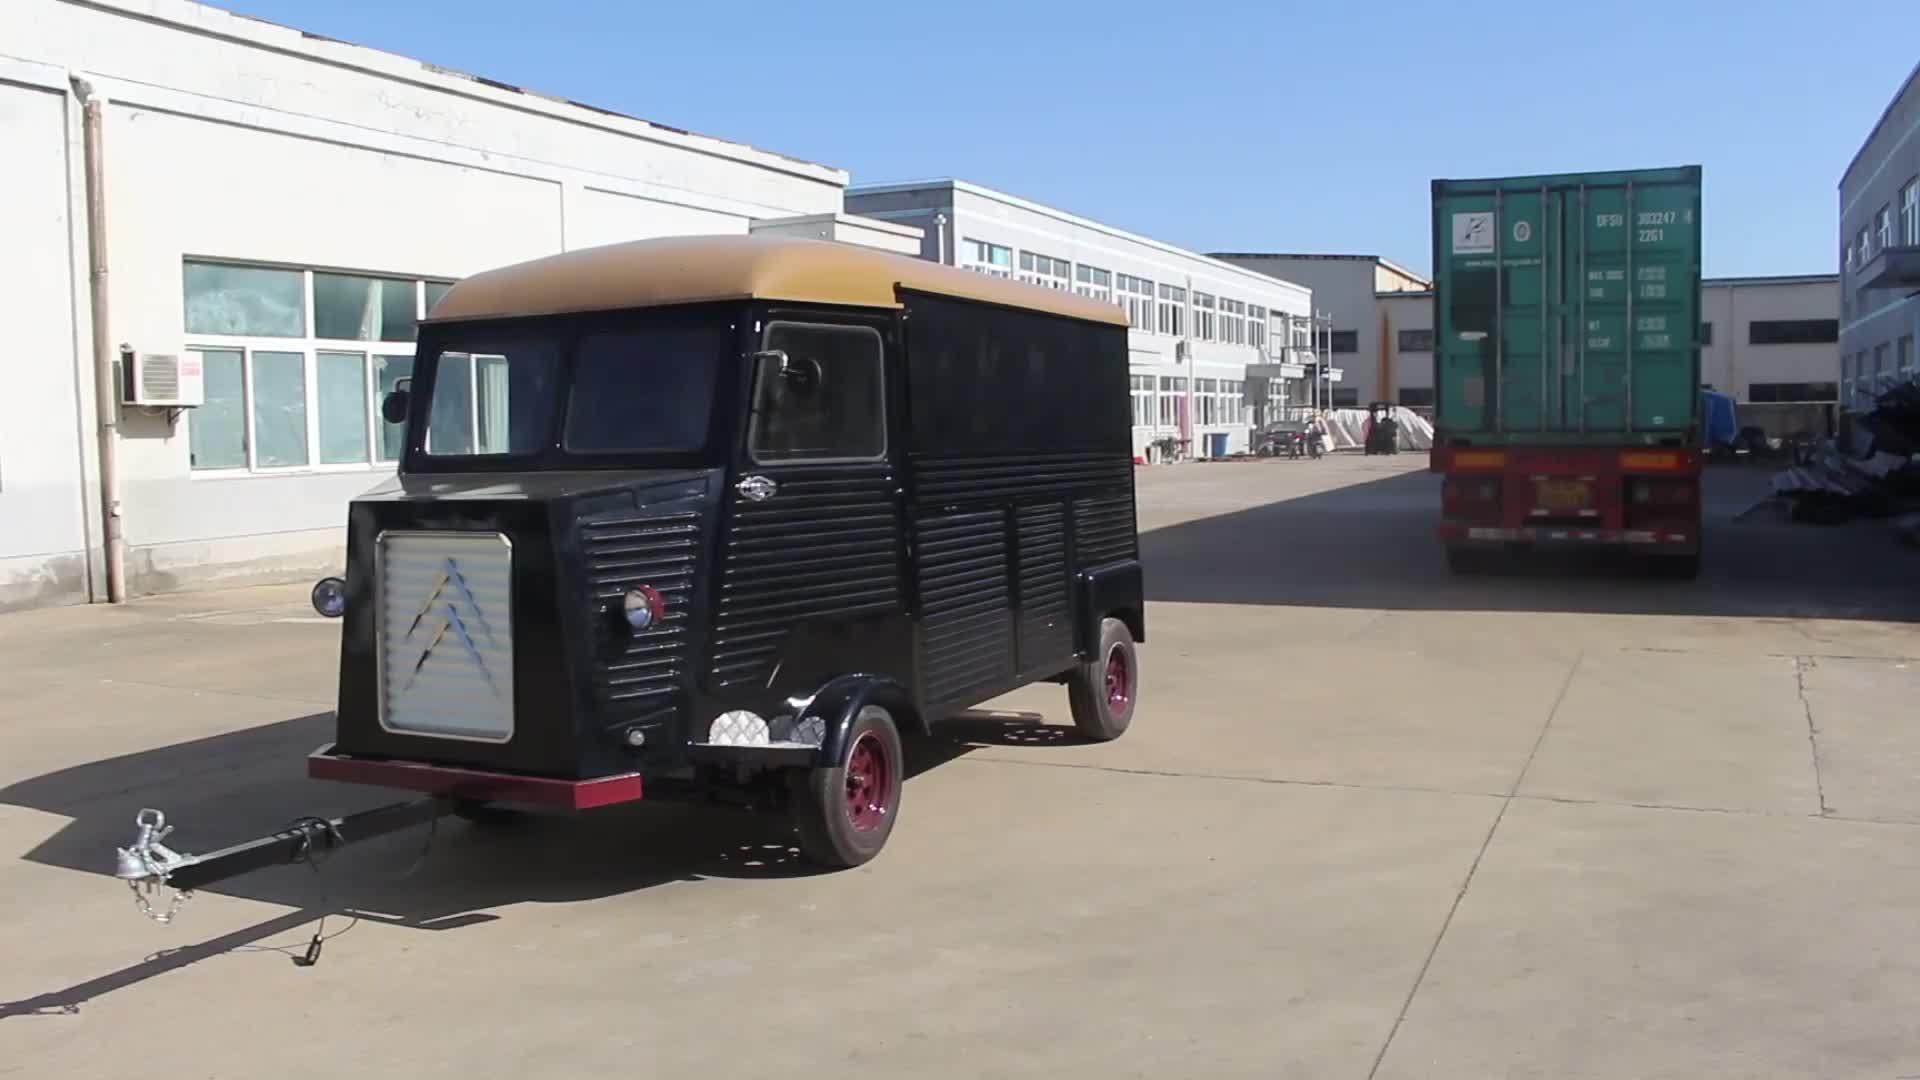 नई सड़क खाद्य वेंडिंग गाड़ी/इलेक्ट्रिक विंटेज VW citroen खाद्य ट्रक/मोबाइल खाद्य ट्रेलर बिक्री